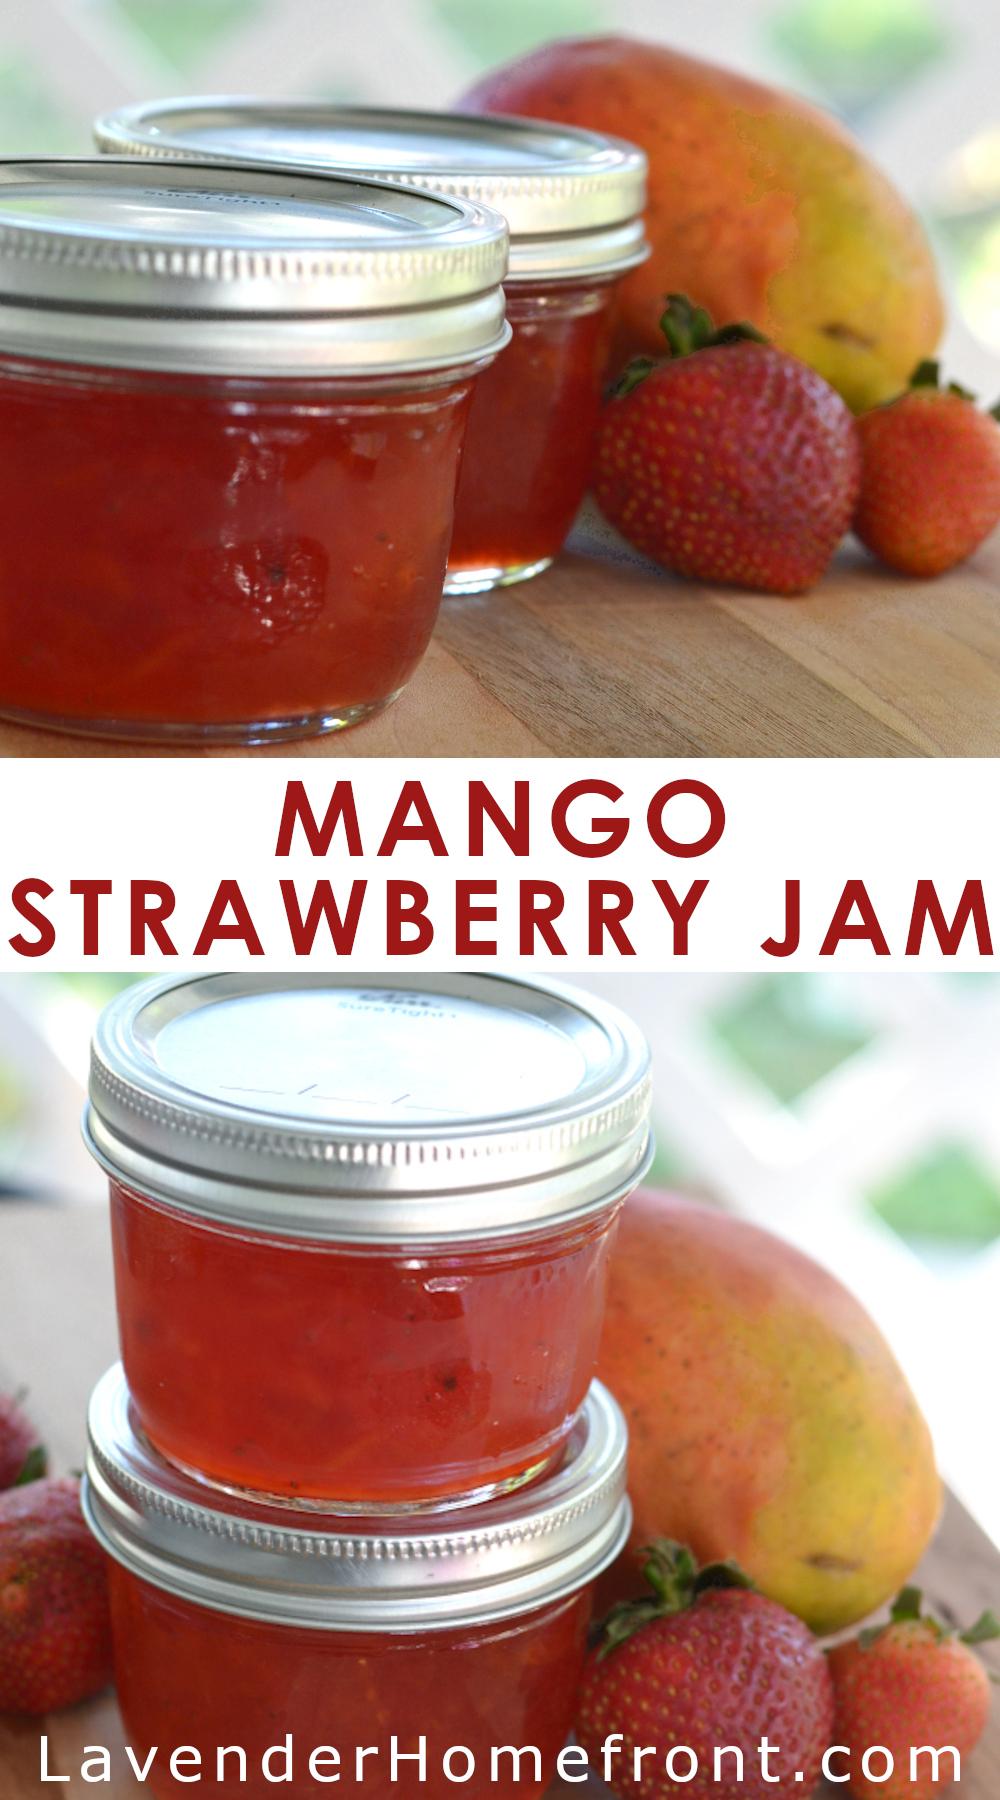 Homemade strawberry mango jam recipe pinnable image.